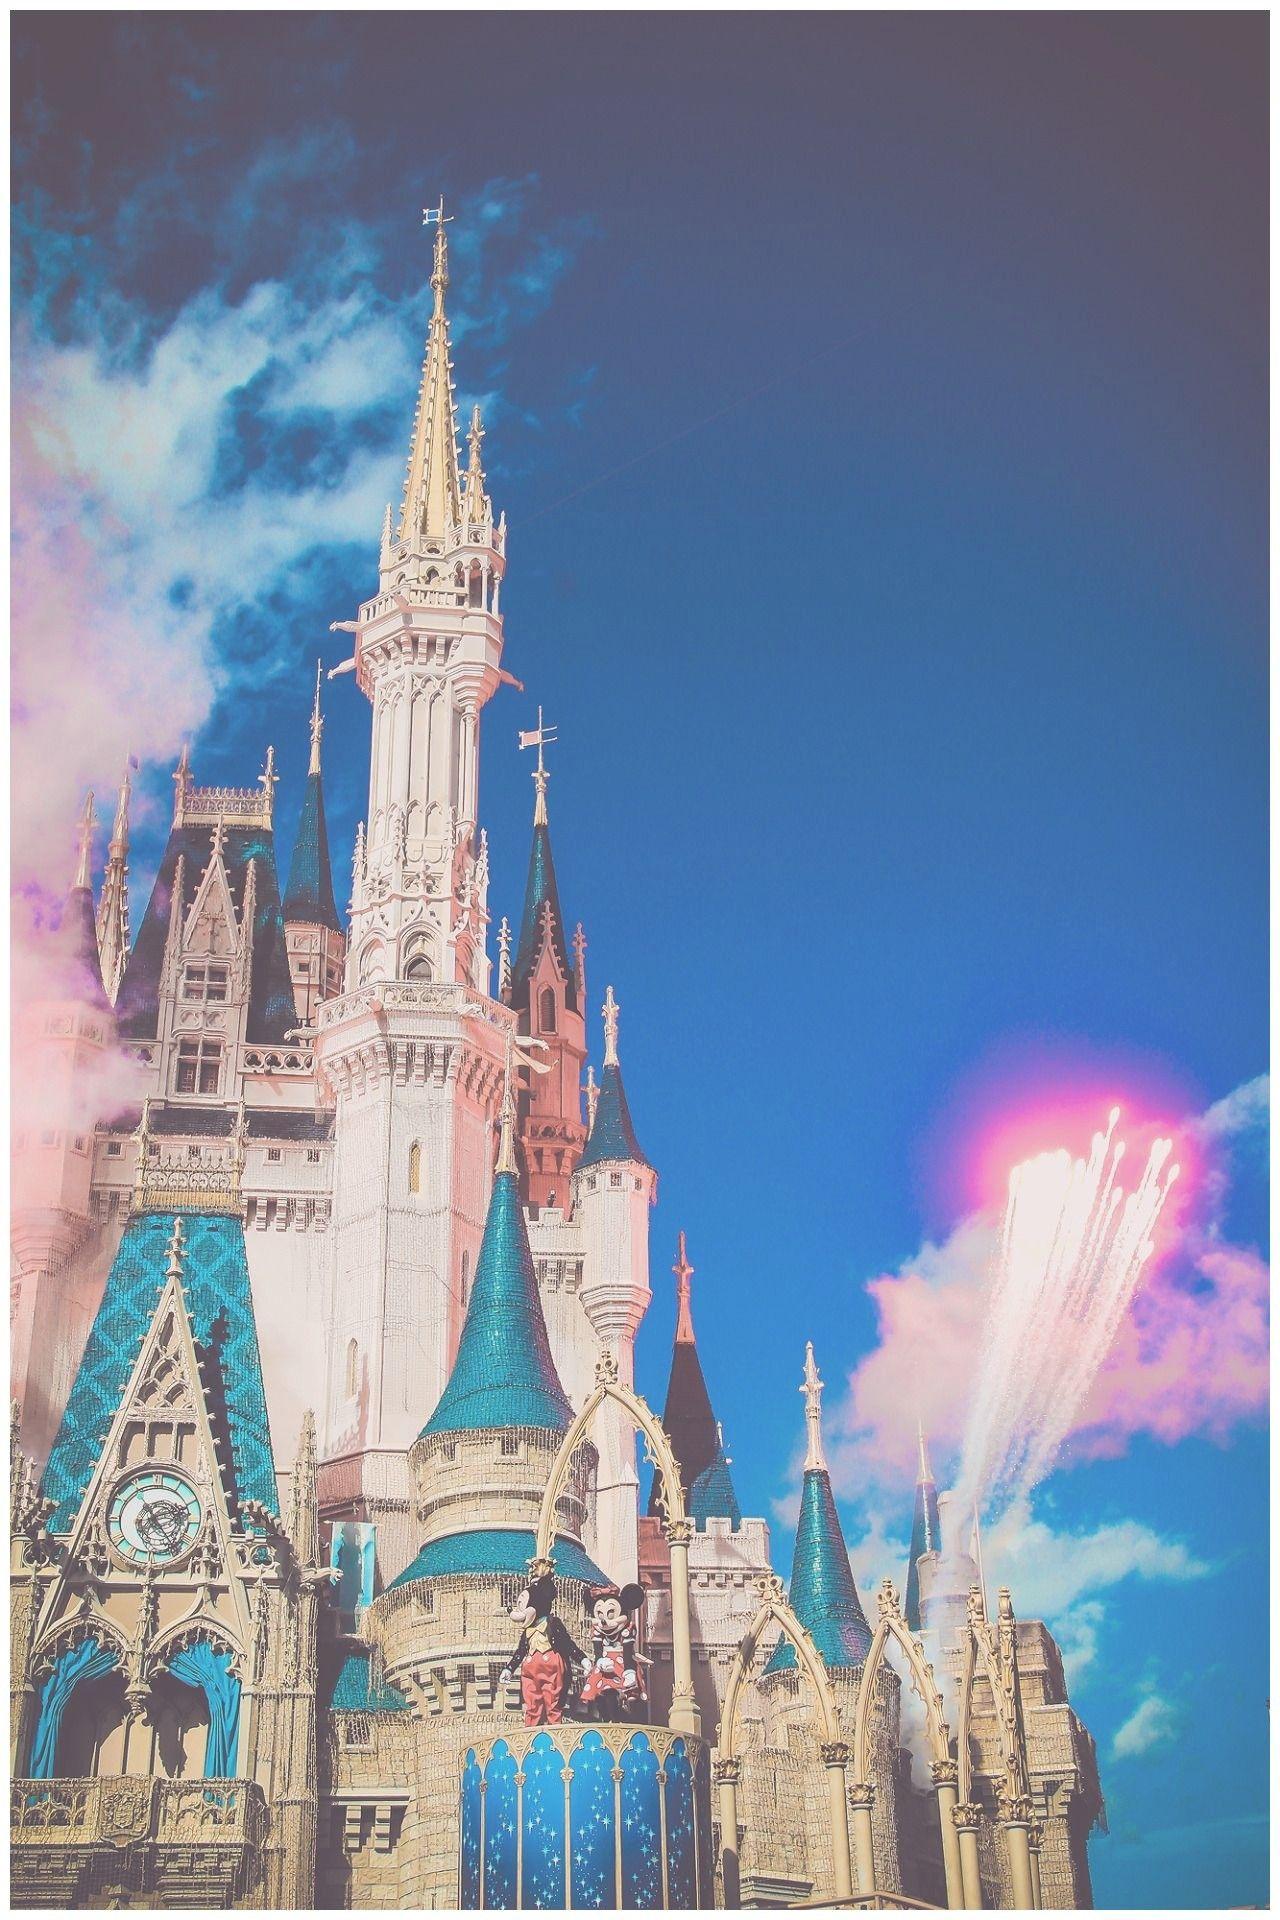 Disney World Cinderella Castle Wallpapers Wallpaper Cave